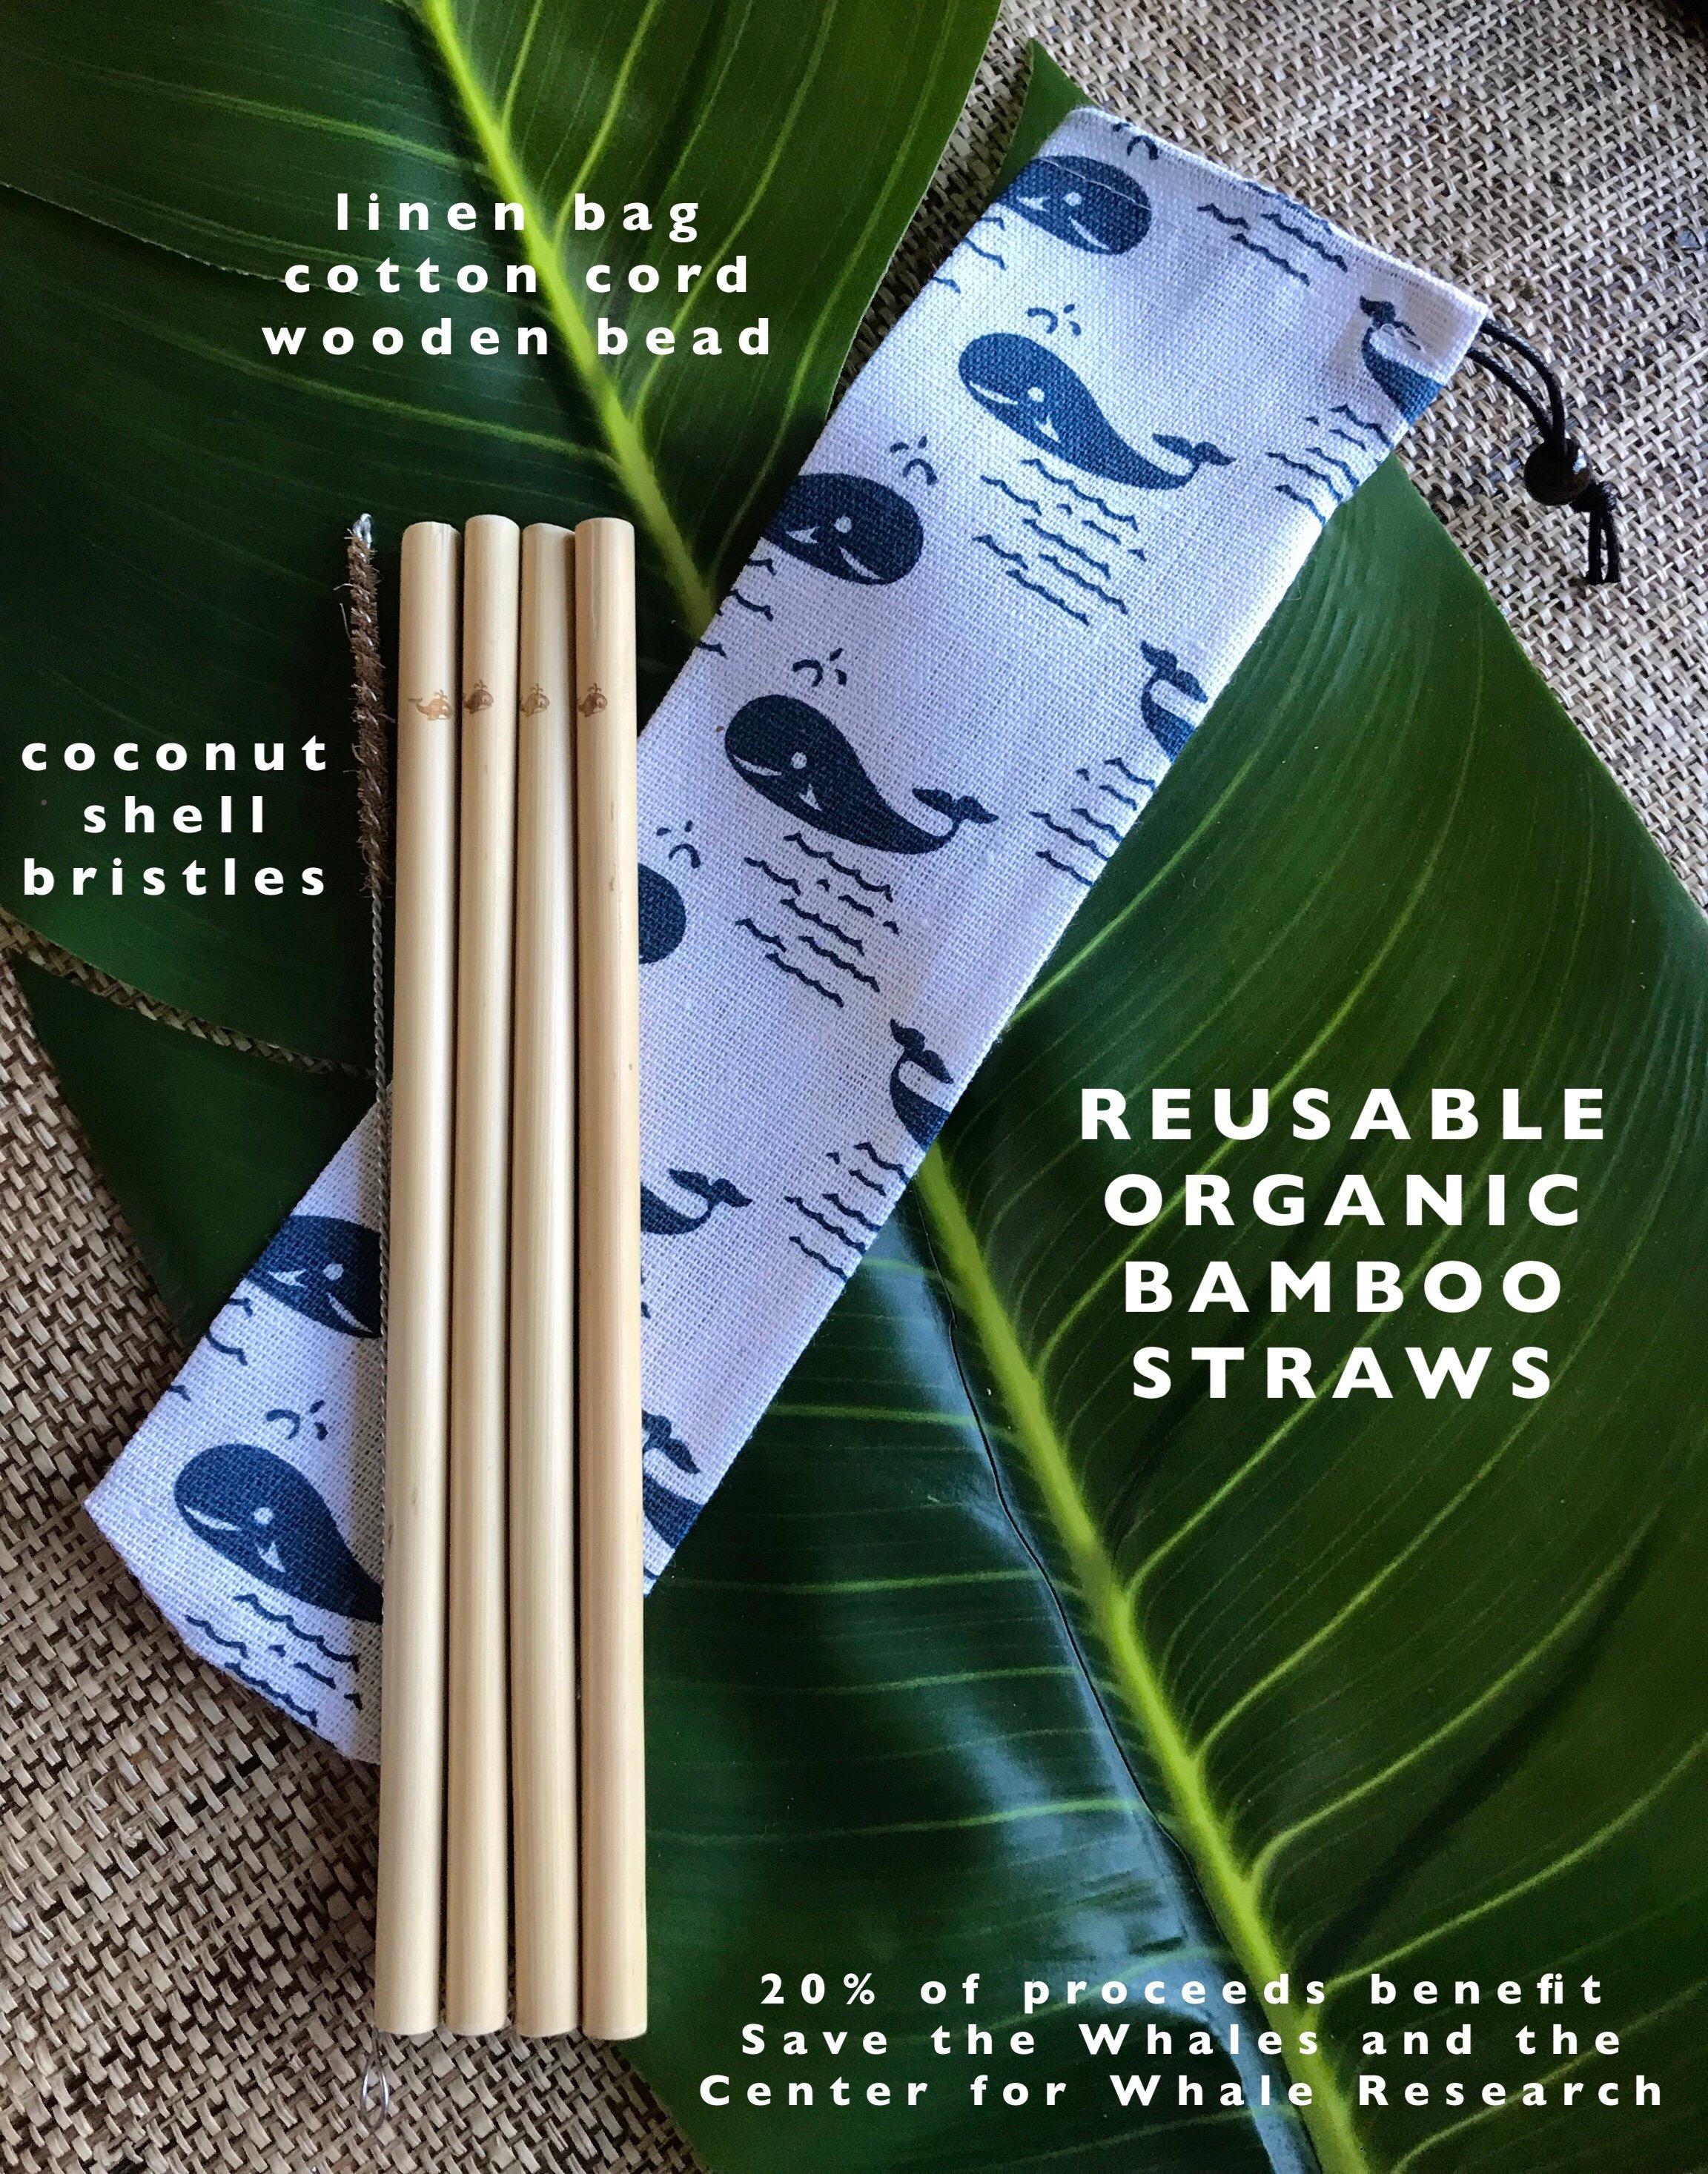 FREE SHIPPING to US - Custom Bamboo Straw Packs: Organic